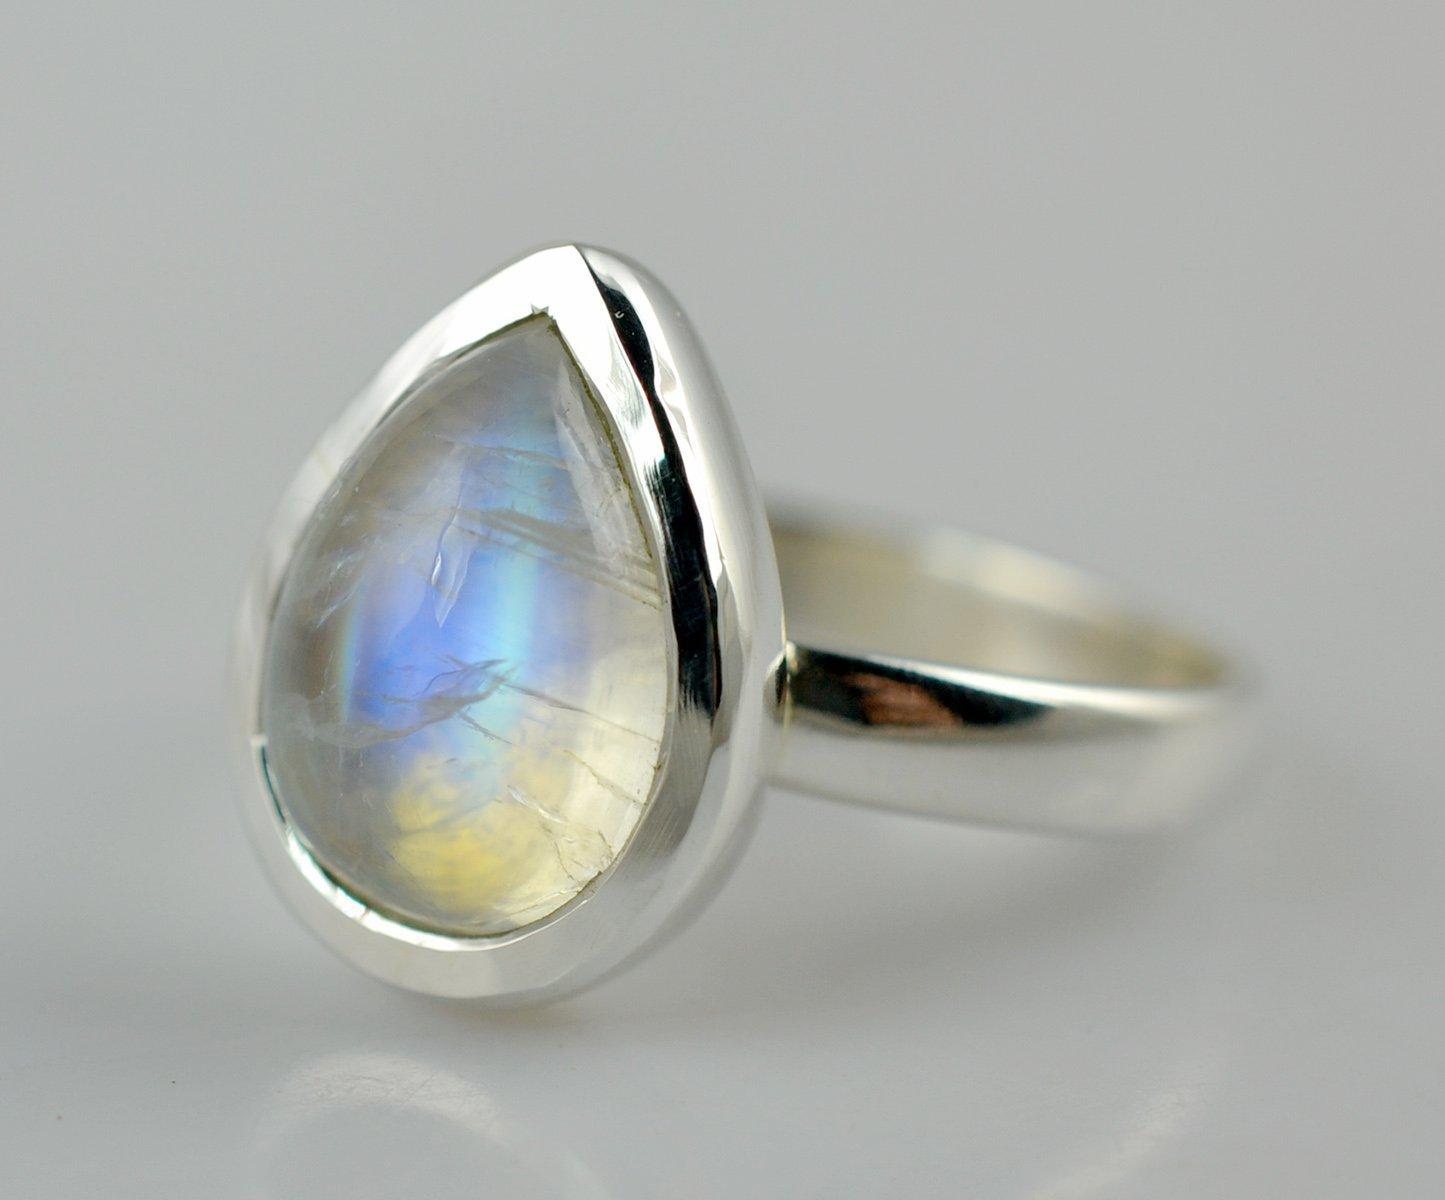 natural stone rainbow Moonstone ring silver ring Moonstone Ring 92.5 Sterling silver jewellery